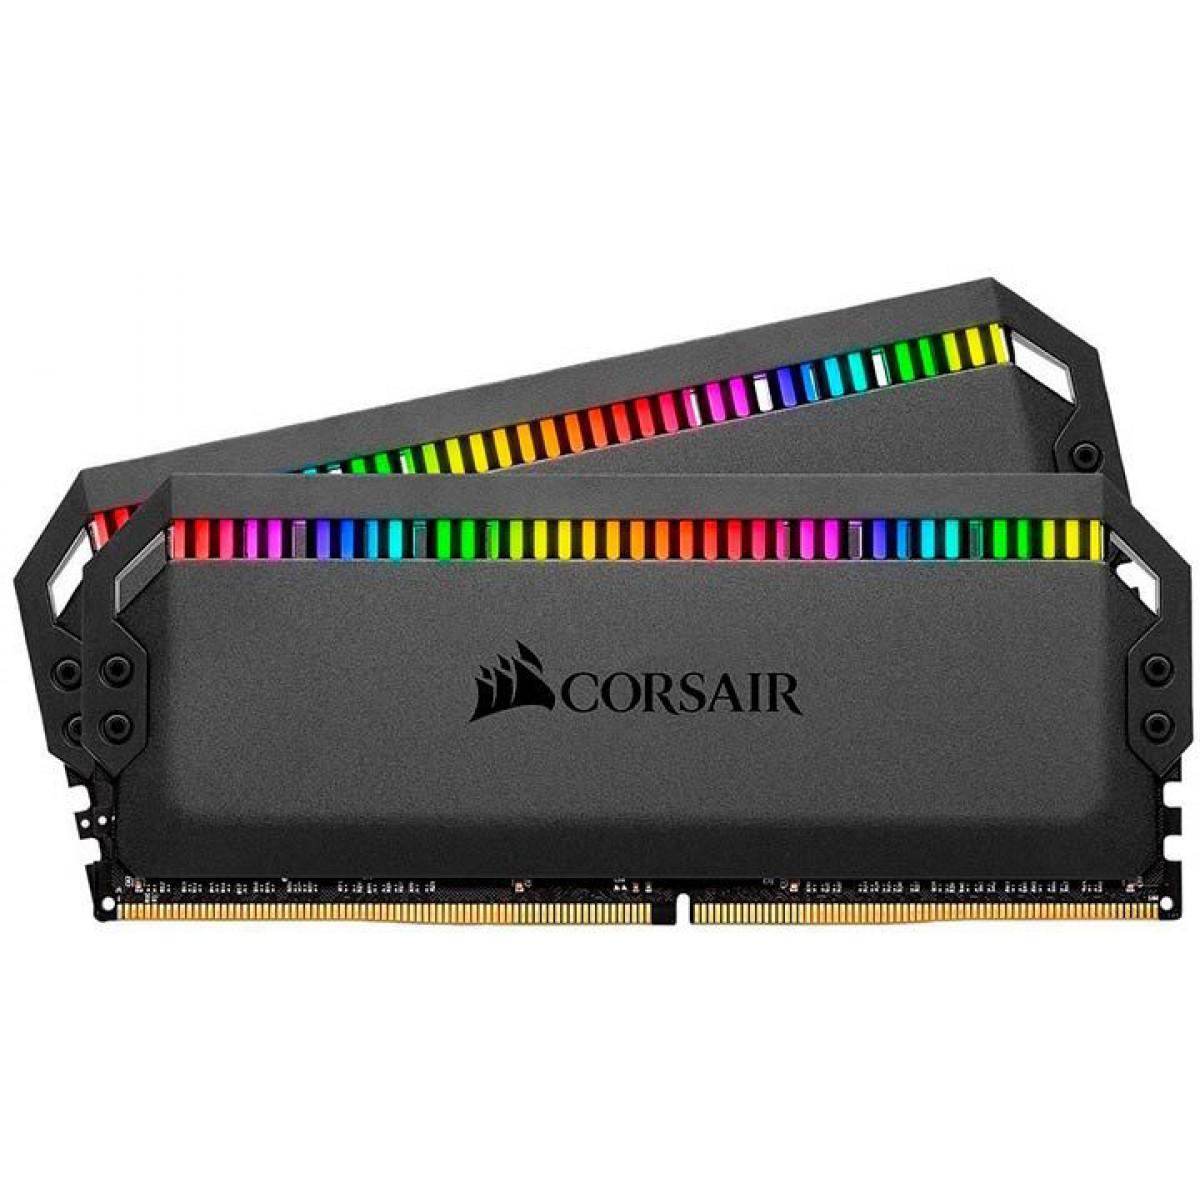 Memória DDR4 Corsair Dominator Platinum RGB, 16GB (2x8GB), 3466MHz, CMT16GX4M2C3466C16